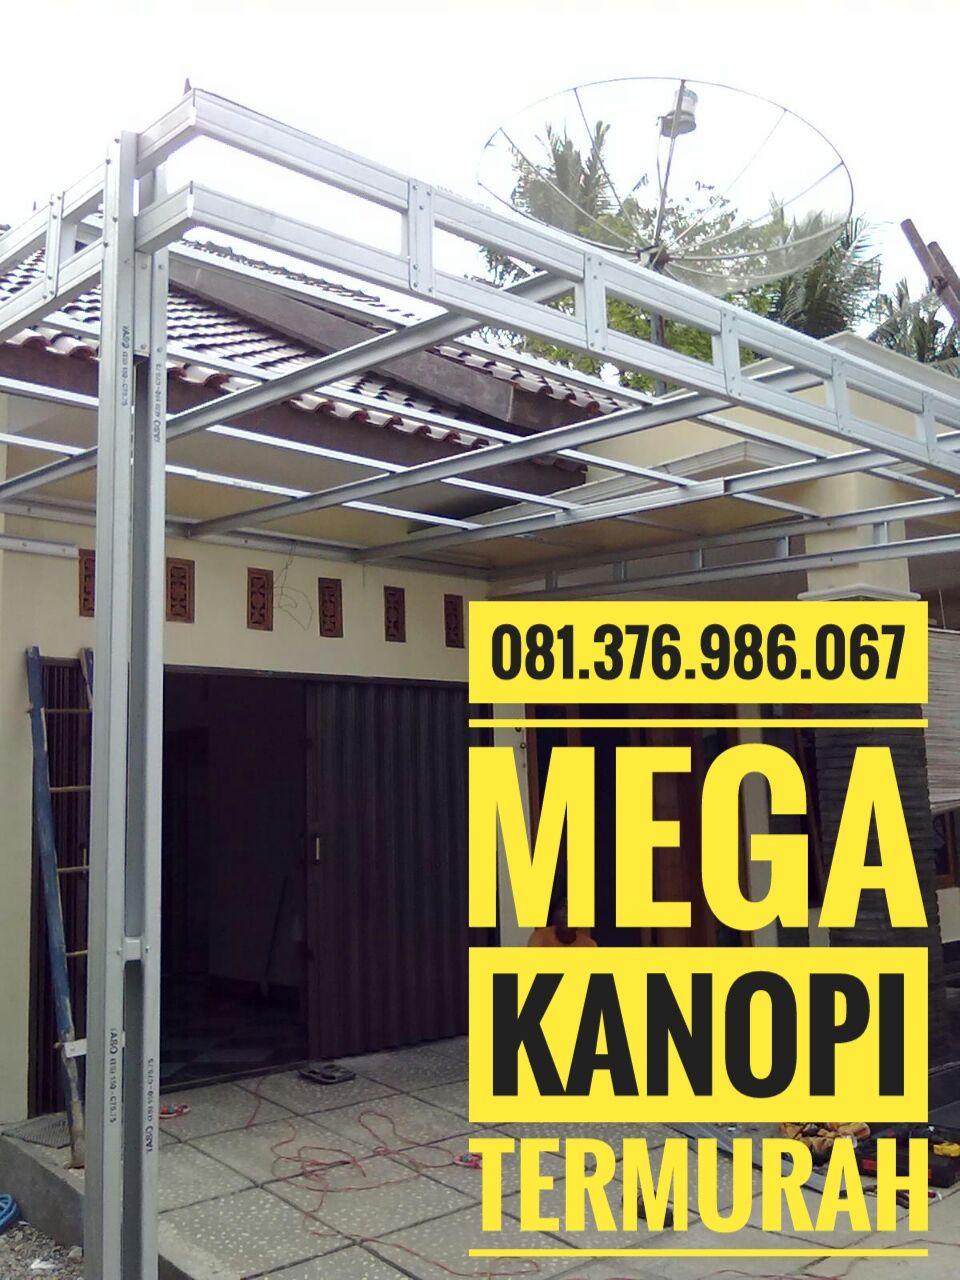 Supplier Baja Ringan Di Semarang 081 376 986 067 Atap 125rb Kanopi 185rb Multiroof Pasir 195rb